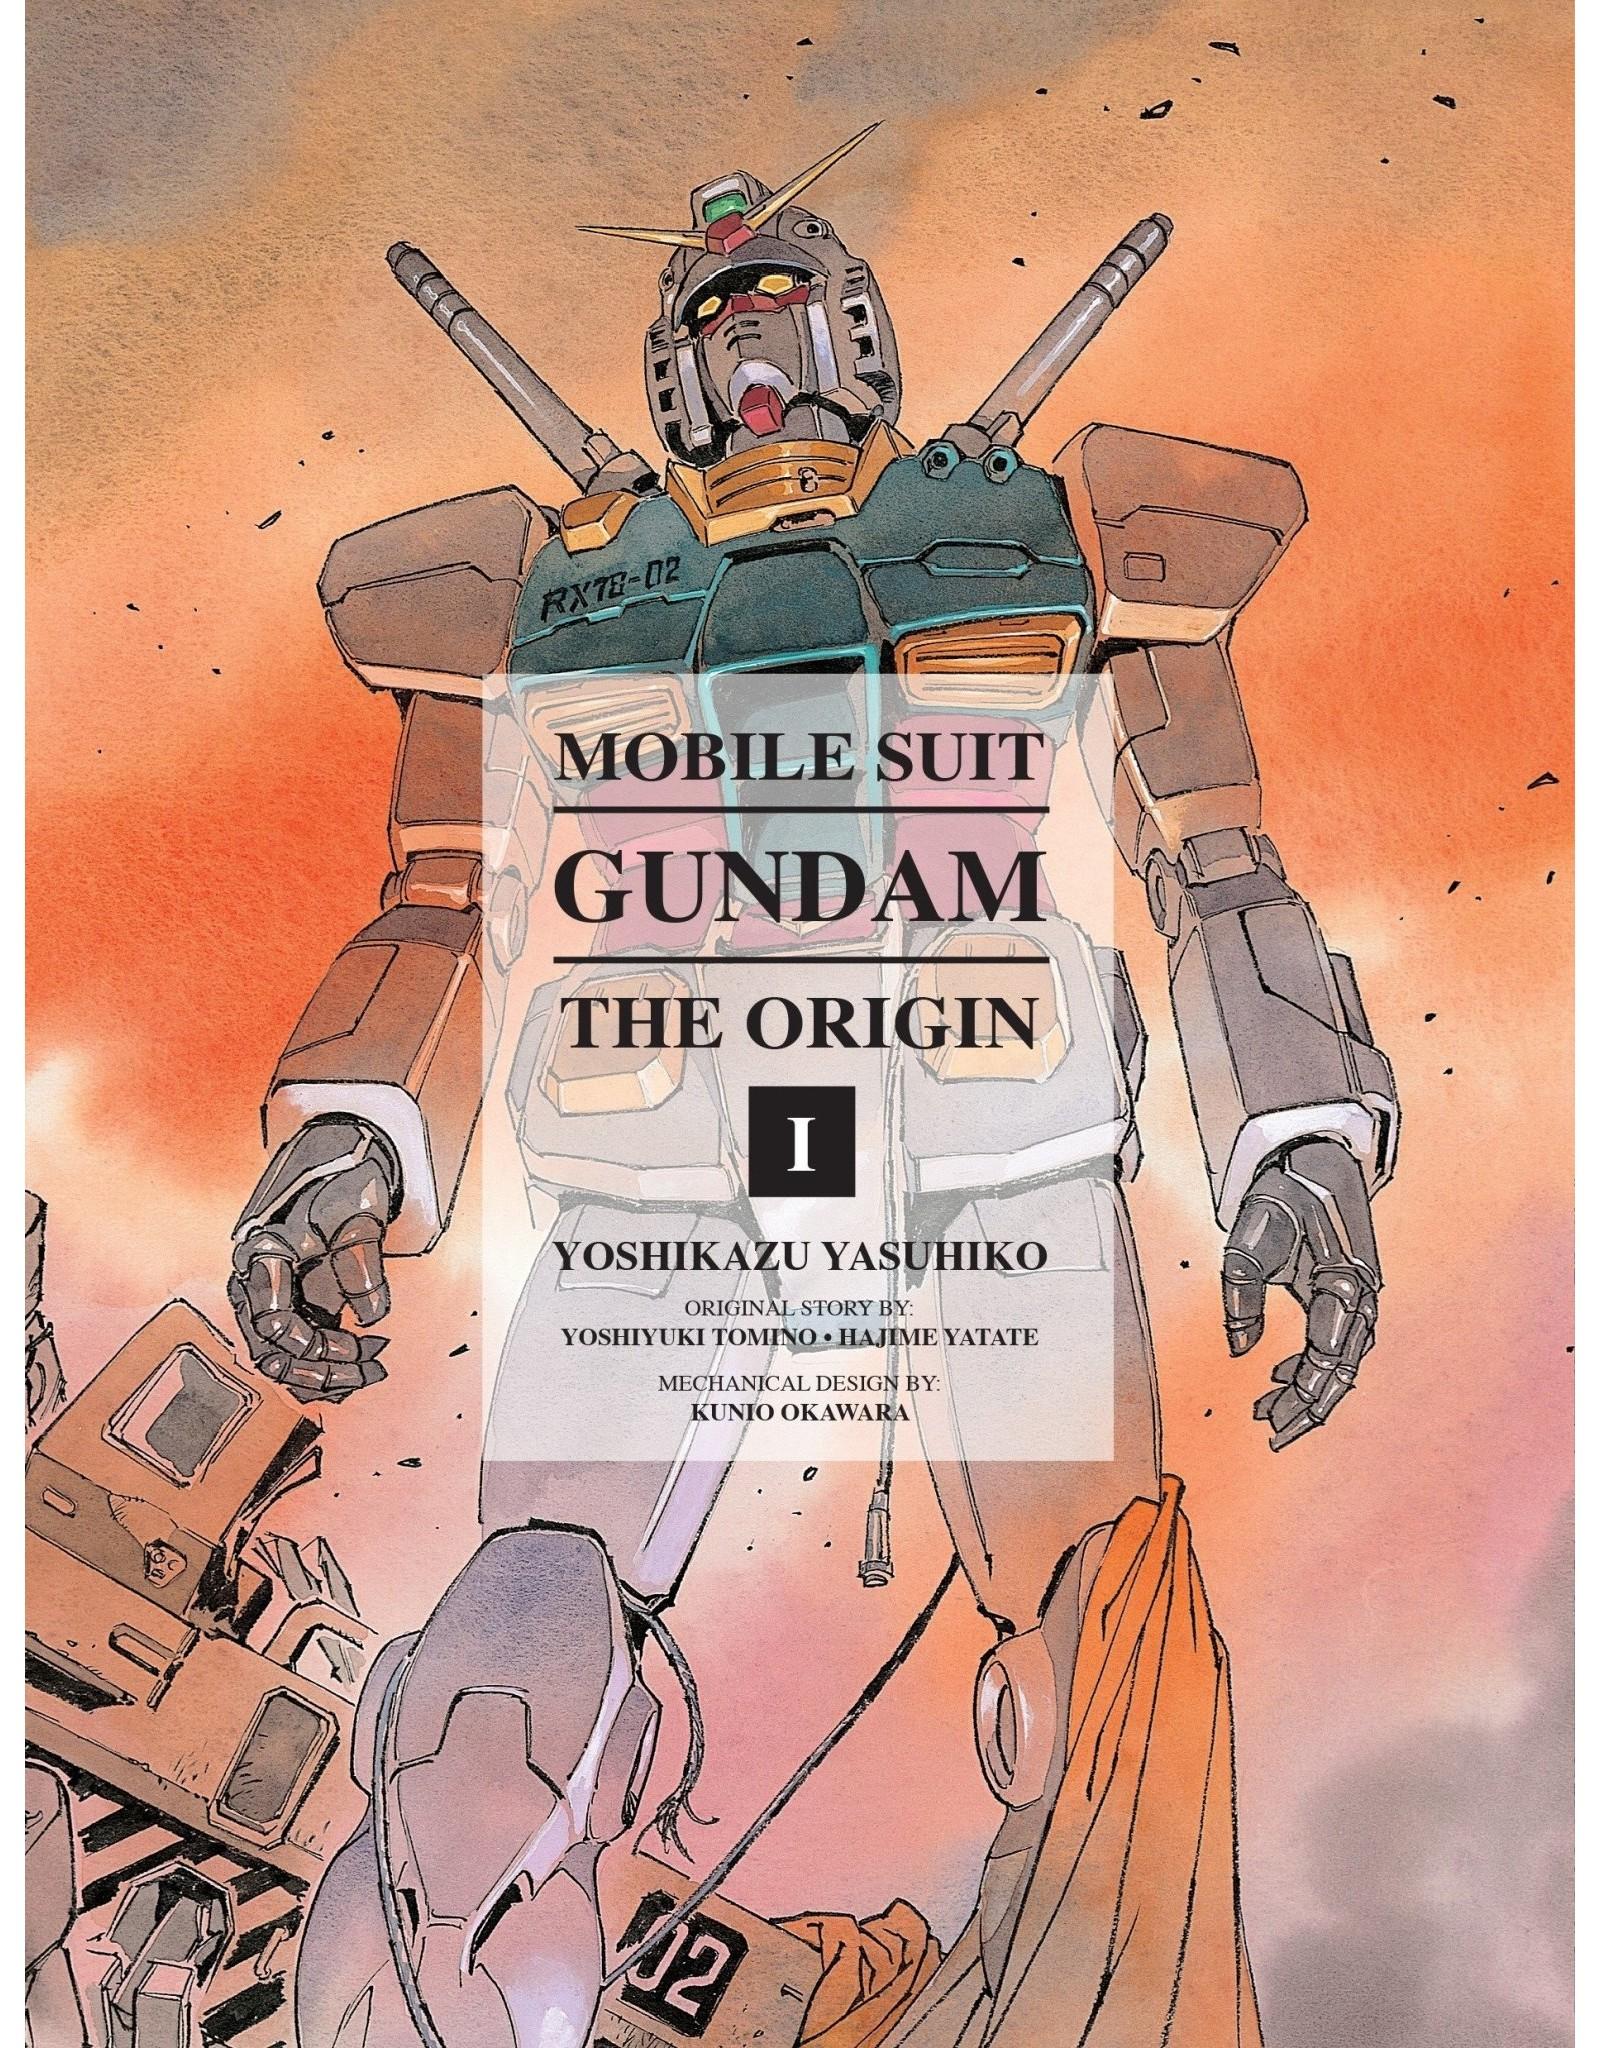 Mobile Suit Gundam: The Origin I (Engelstalig)